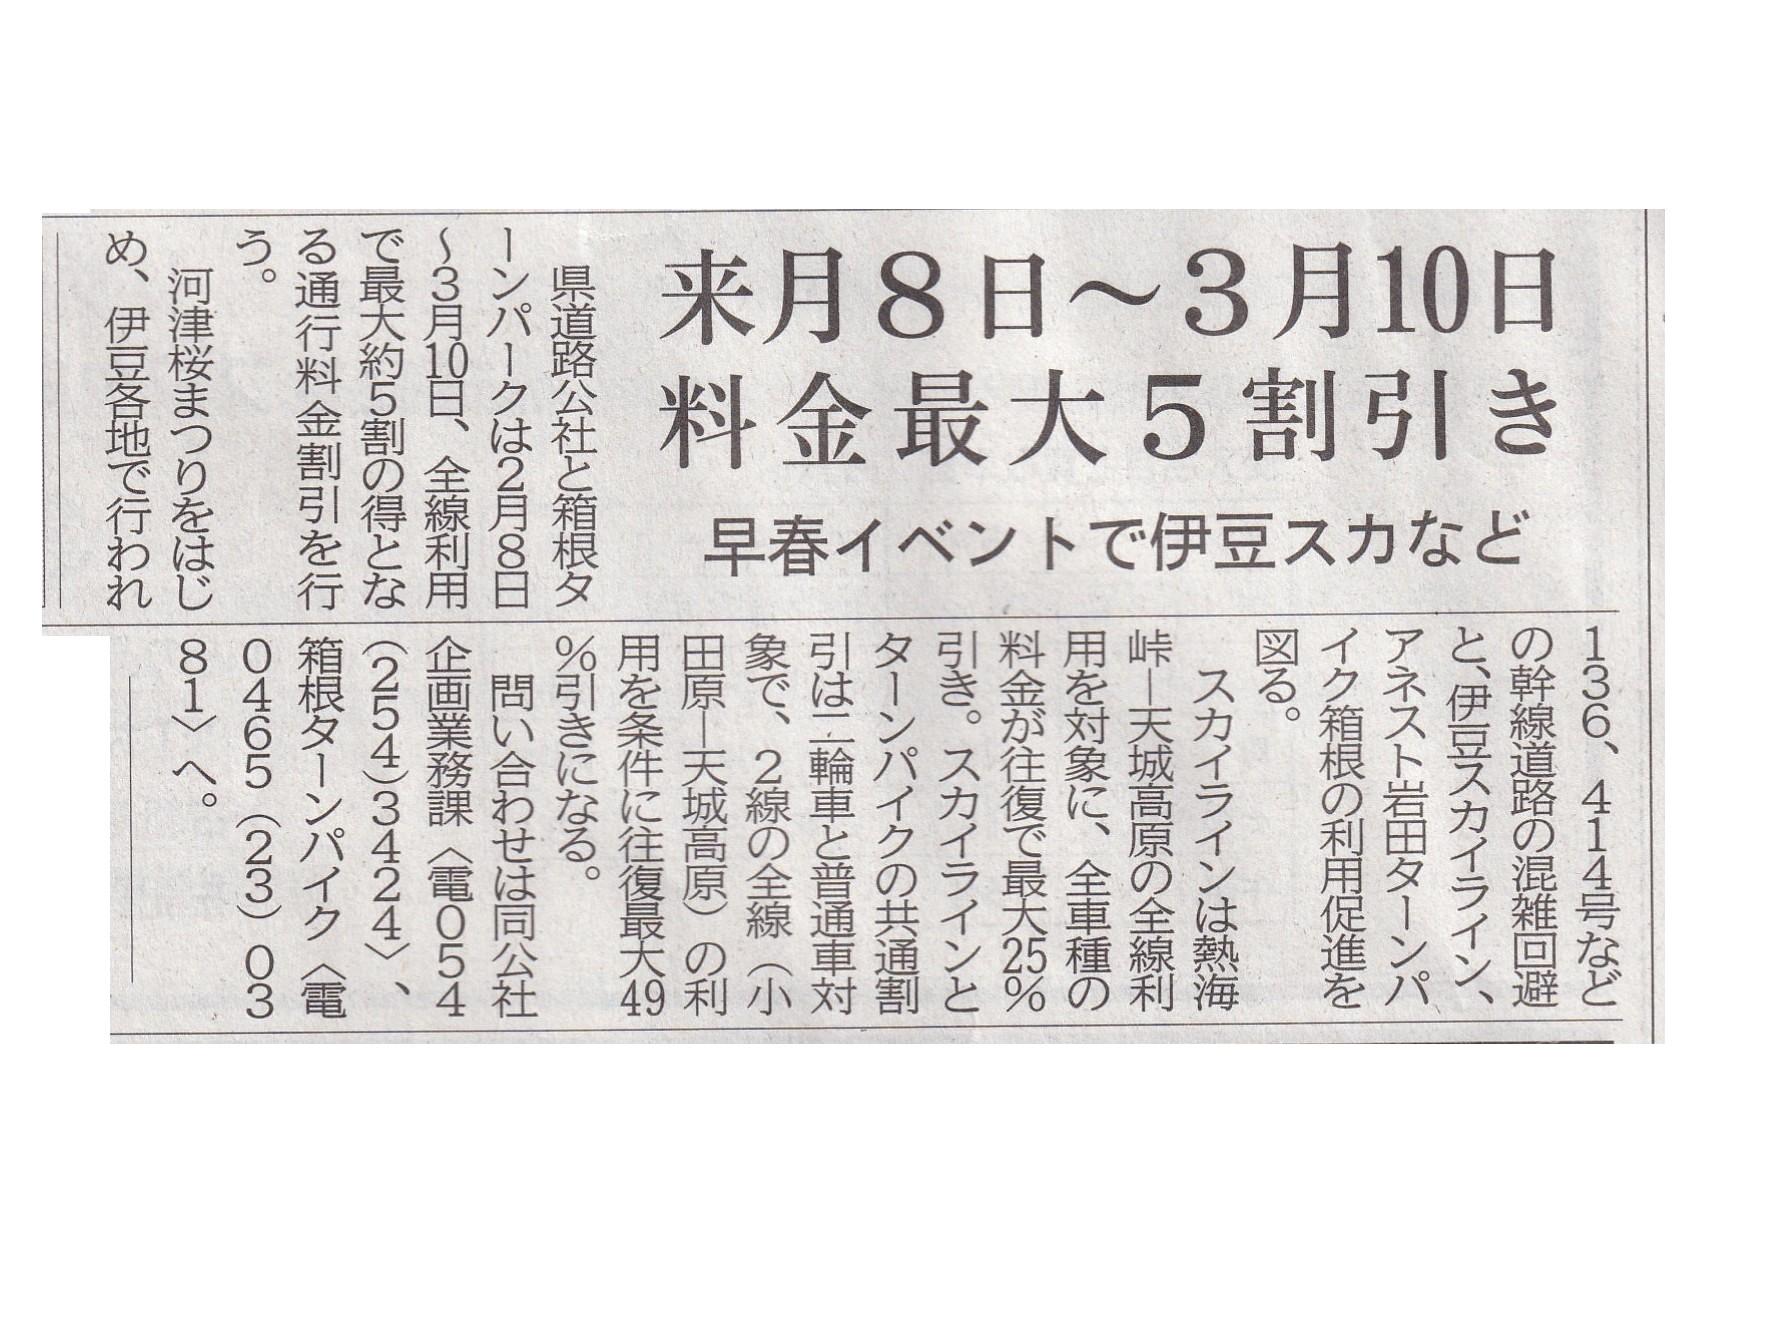 https://www.magaret.jp/mt_img/%E4%BC%8A%E8%B1%86%E3%82%B9%E3%82%AB%E5%89%B2%E5%BC%95_JALAN_200114.jpg